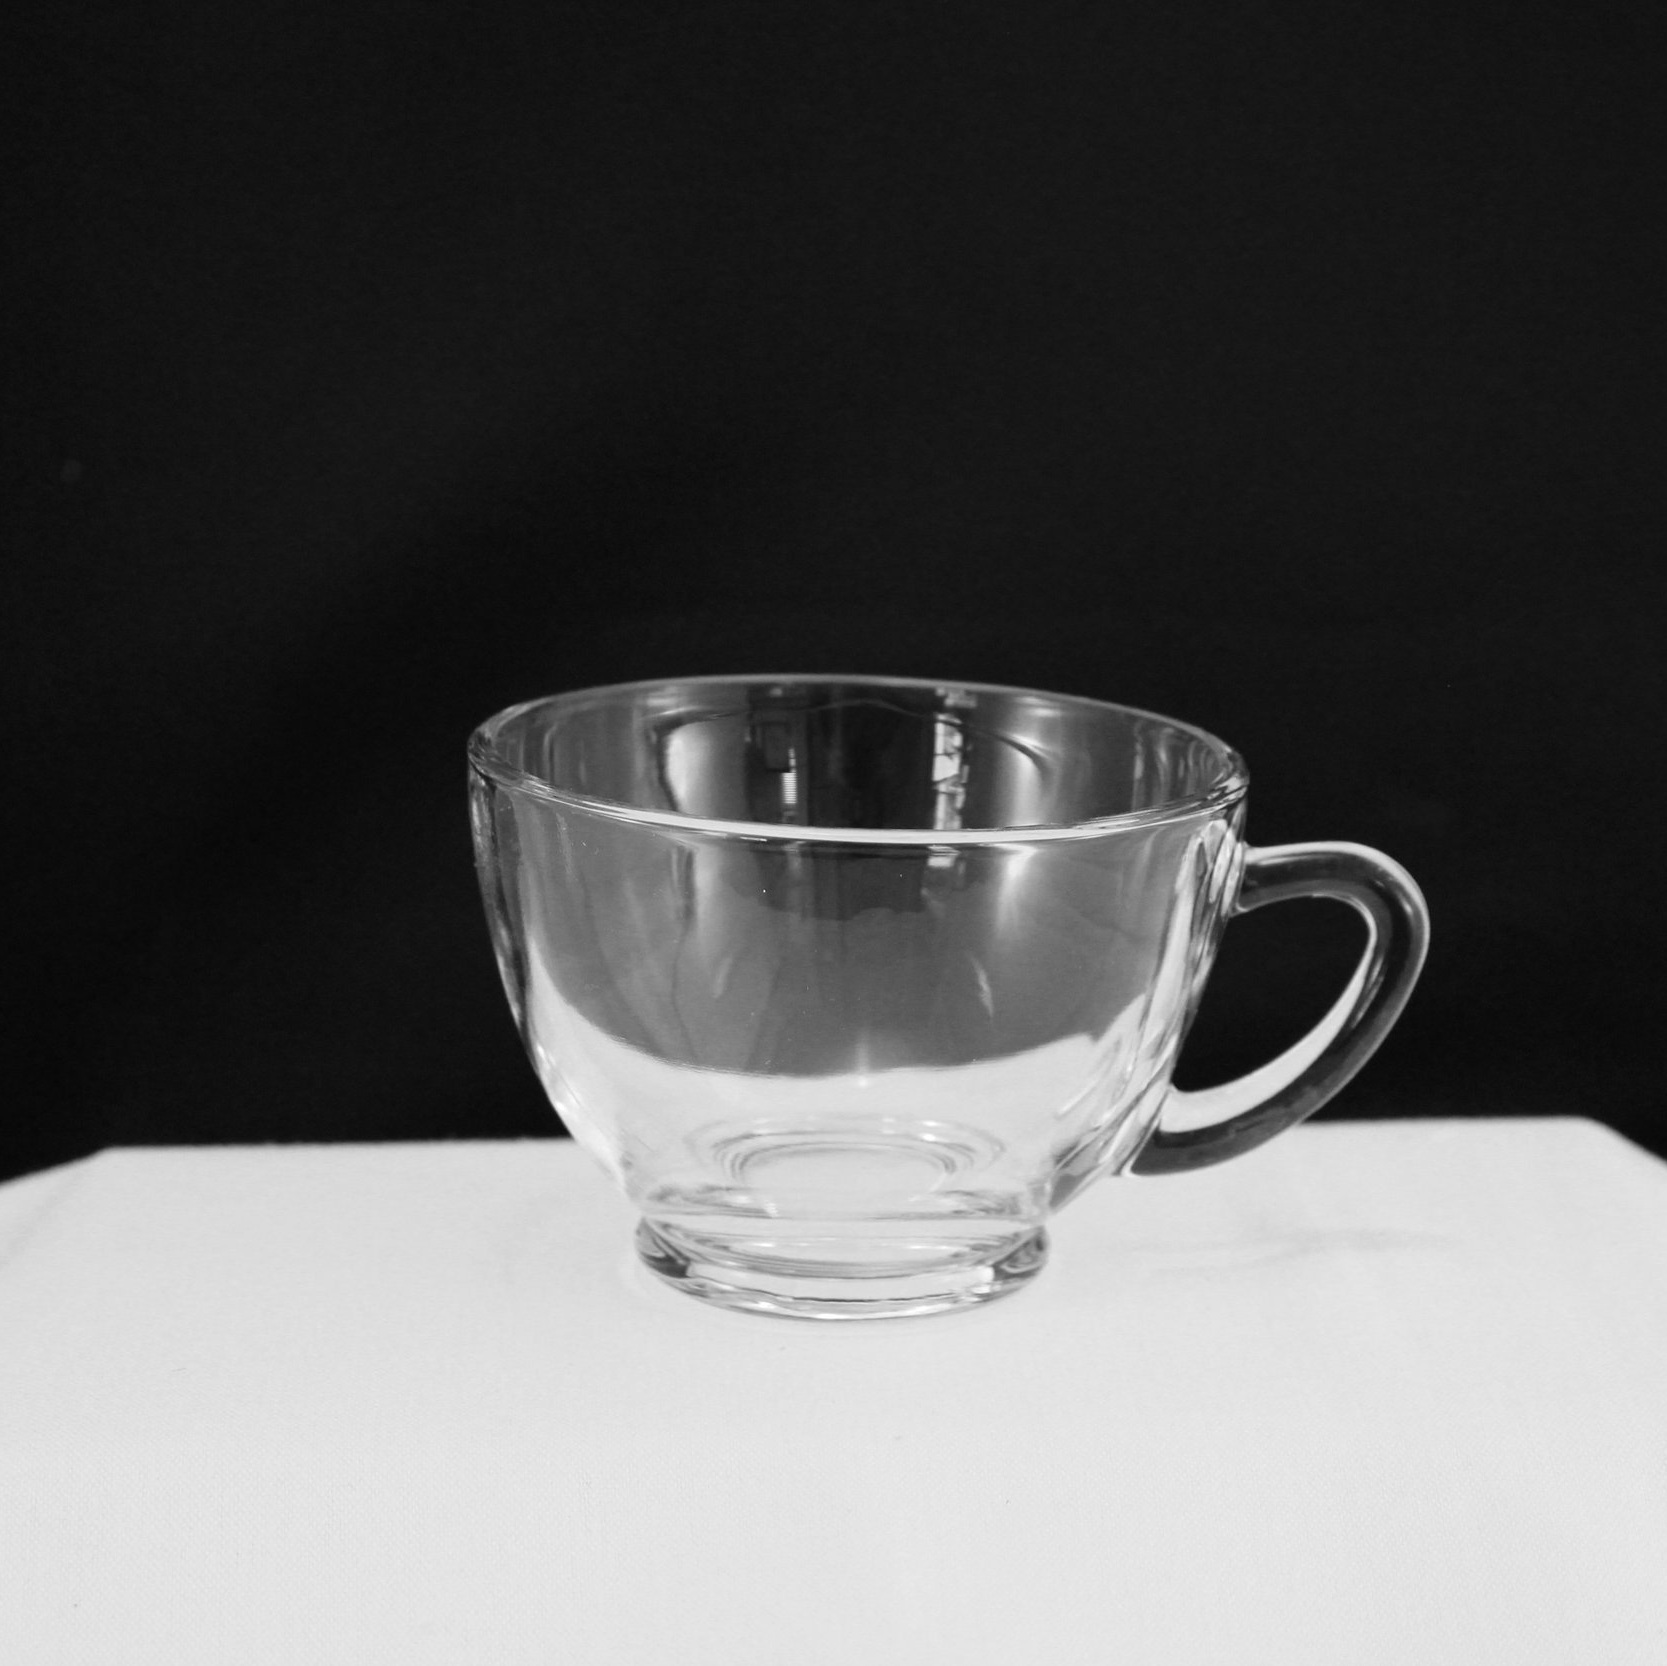 %2817%29+Punch+Cup+%286+oz%29.jpg